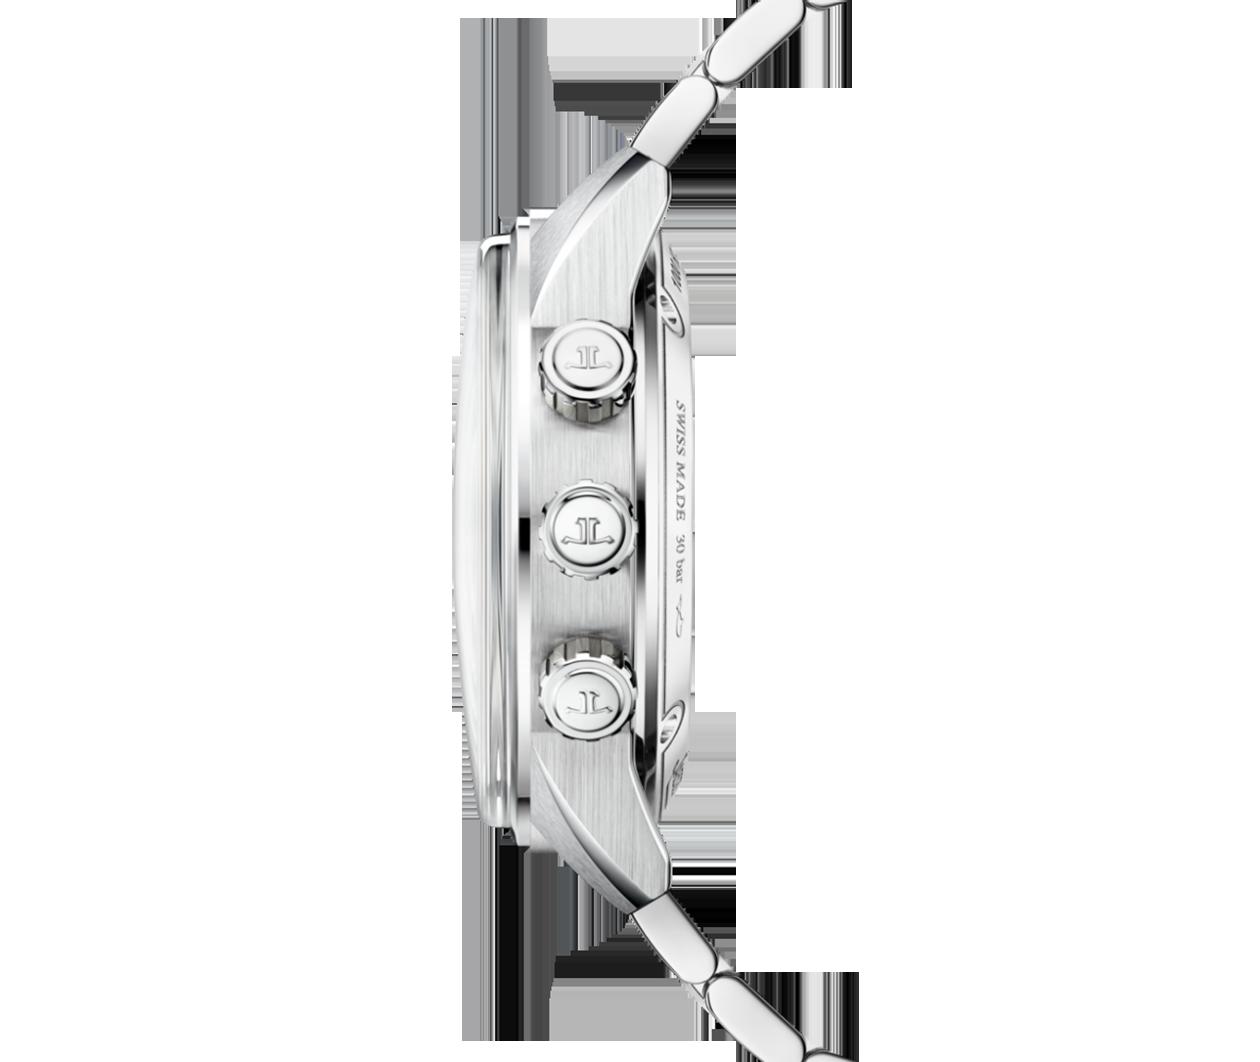 JaegerLeCoultre Polaris MarinerMemovox 9038180 Carousel 2